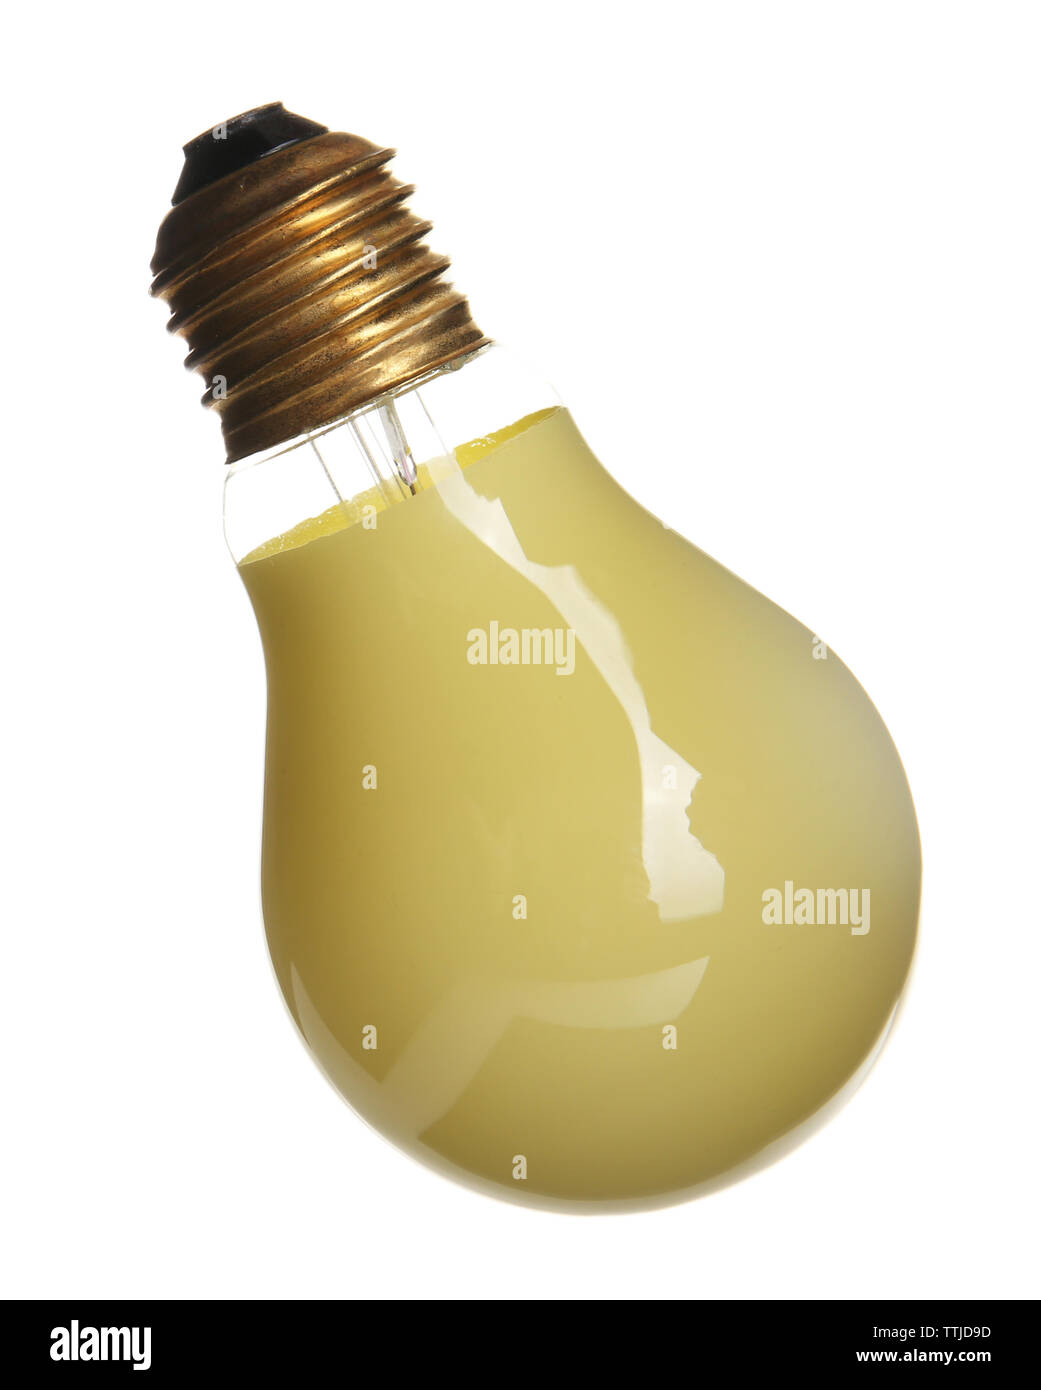 Decorative yellow light bulb, isolated on white - Stock Image